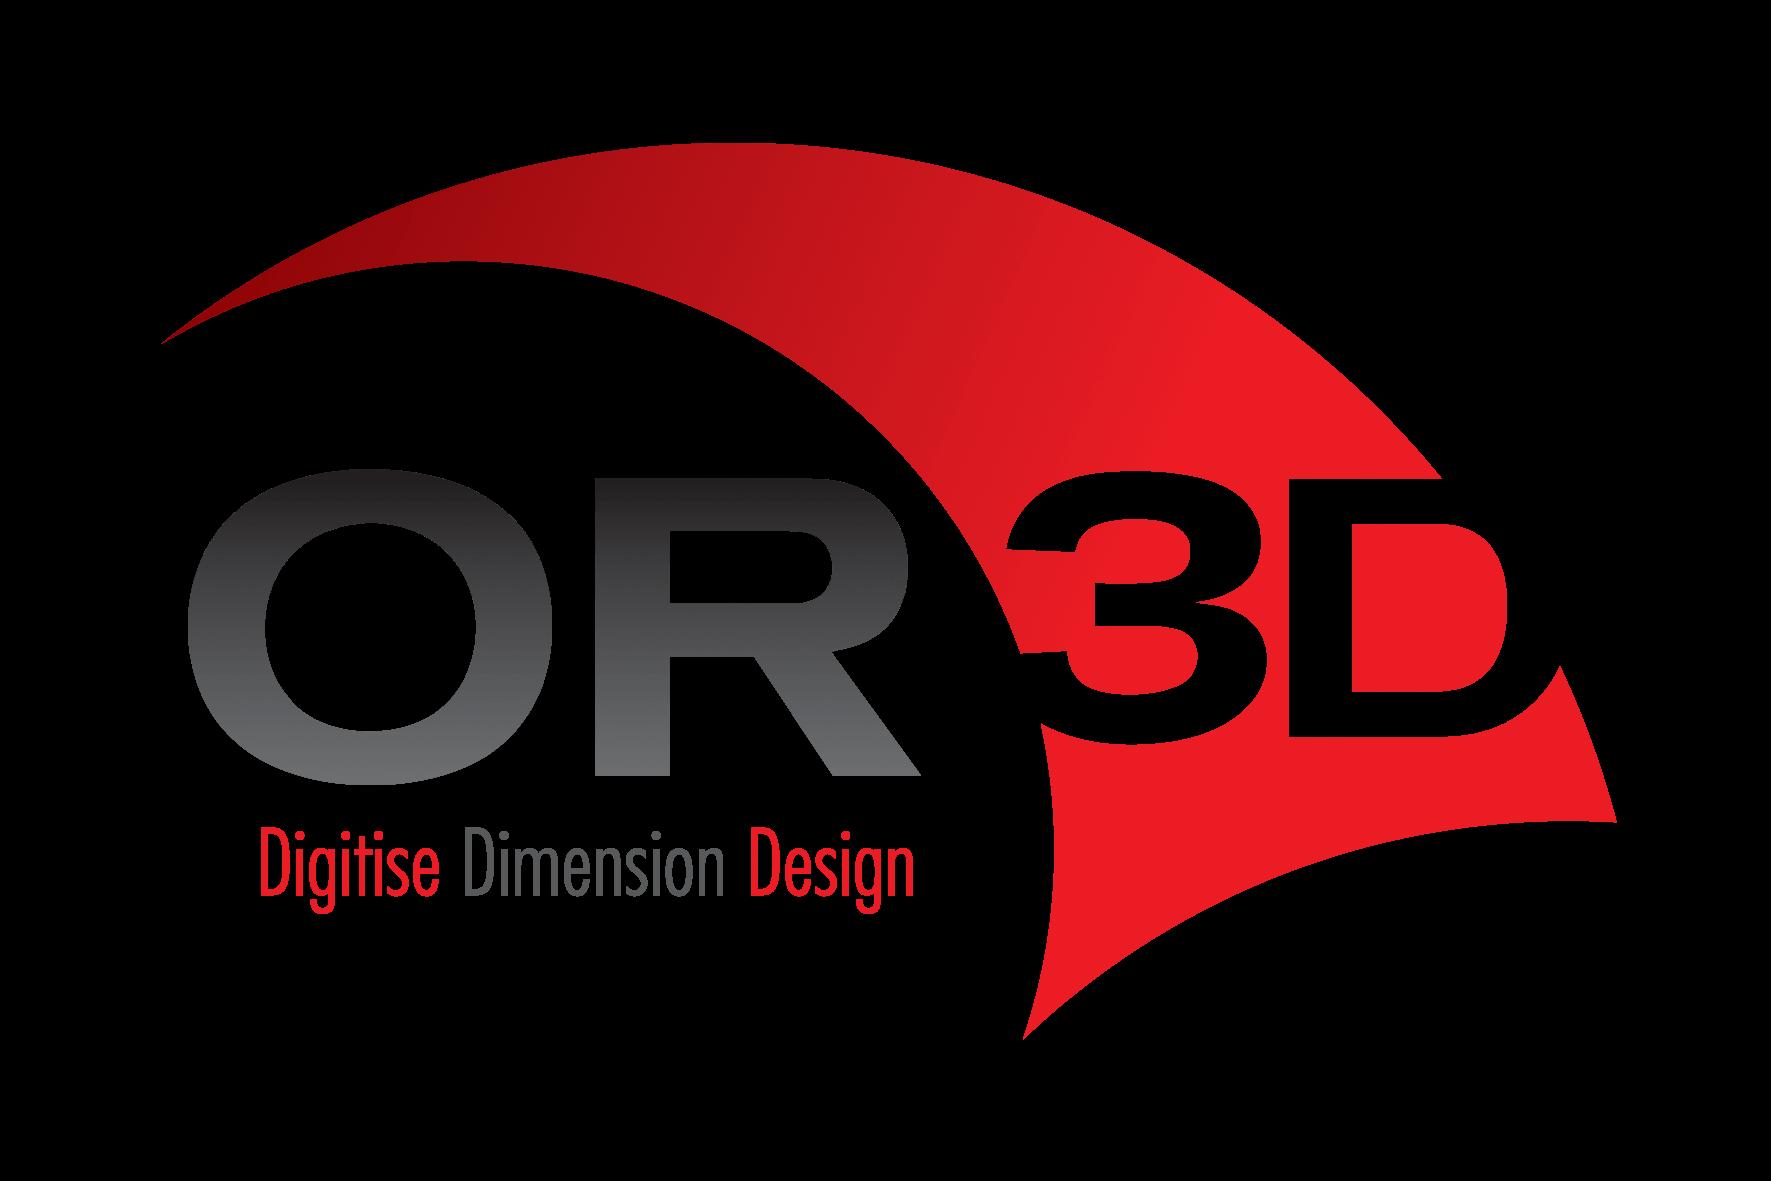 OR3D Ltd